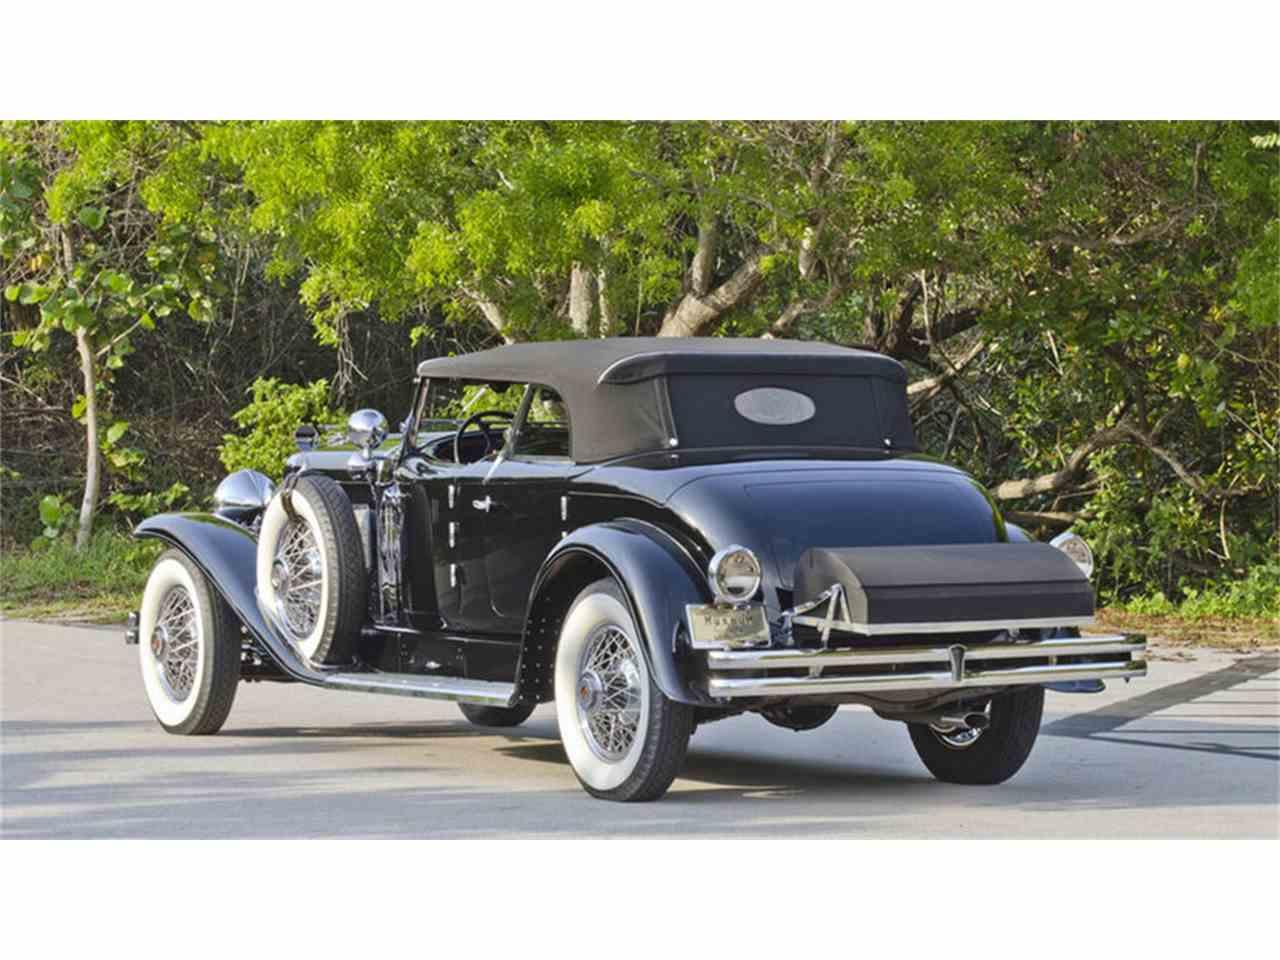 Convertible Rental Cars Indianapolis